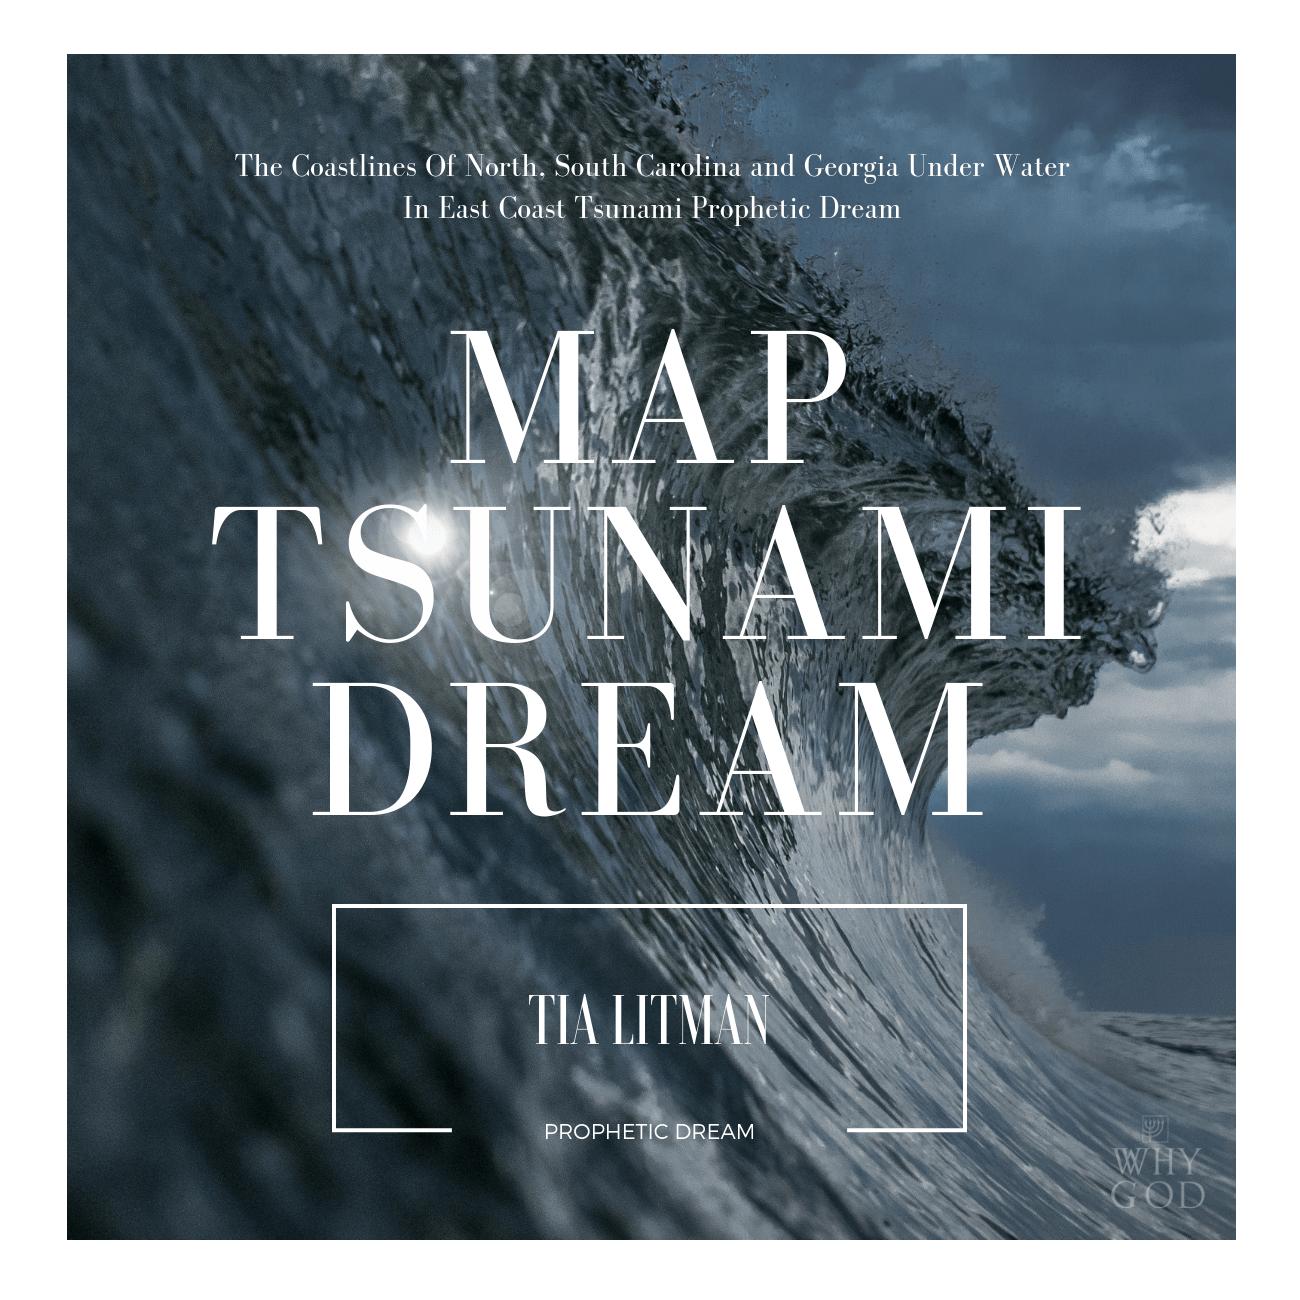 MAP Dream! The Coastlines Of North, South Carolina and Georgia Under